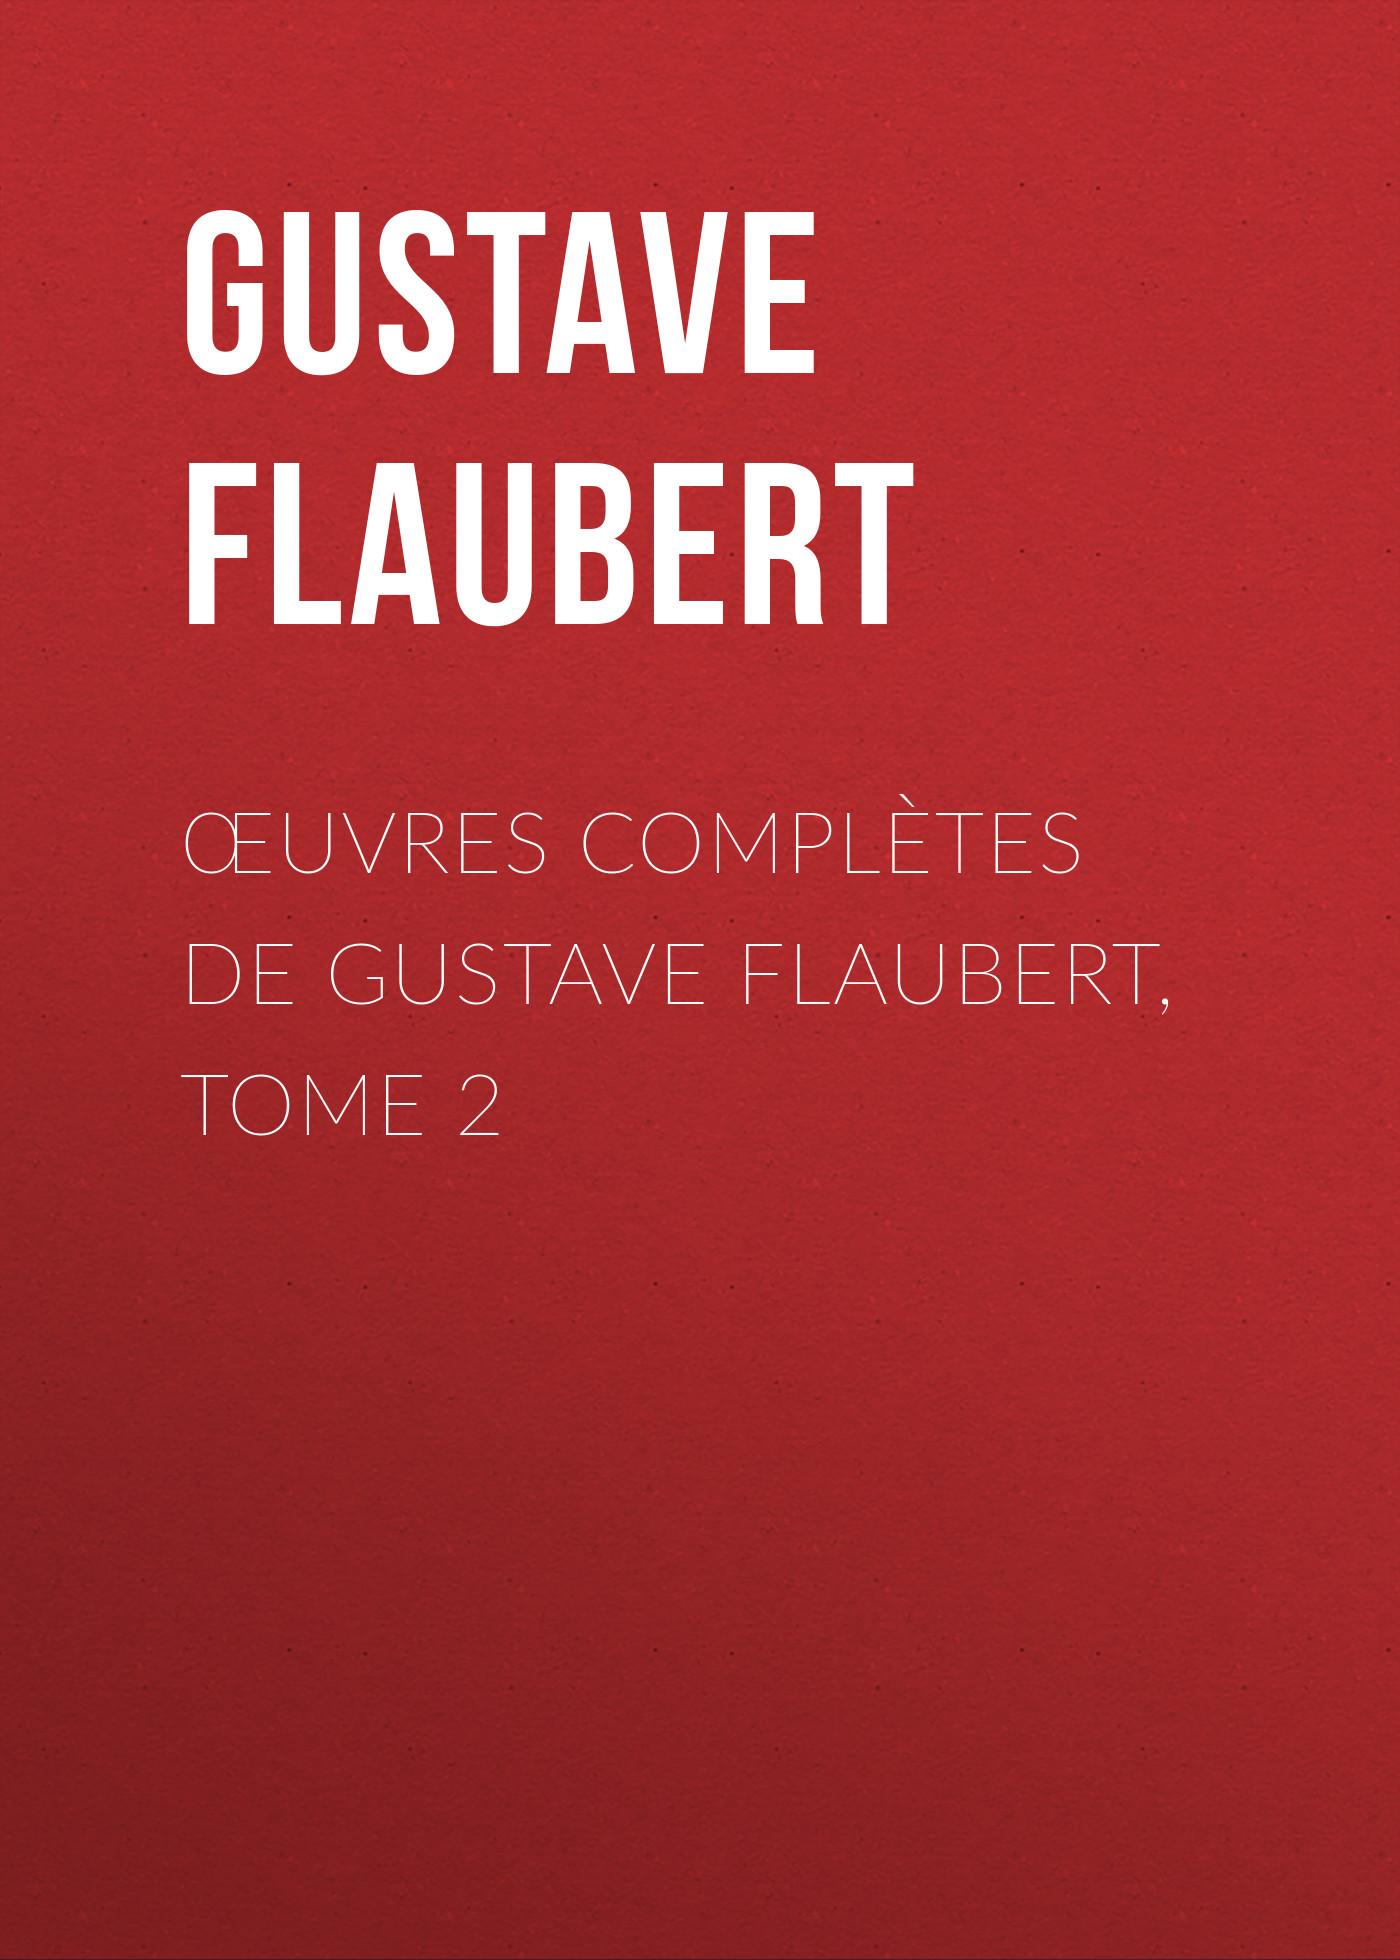 Gustave Flaubert Œuvres complètes de Gustave Flaubert, tome 2 цена и фото